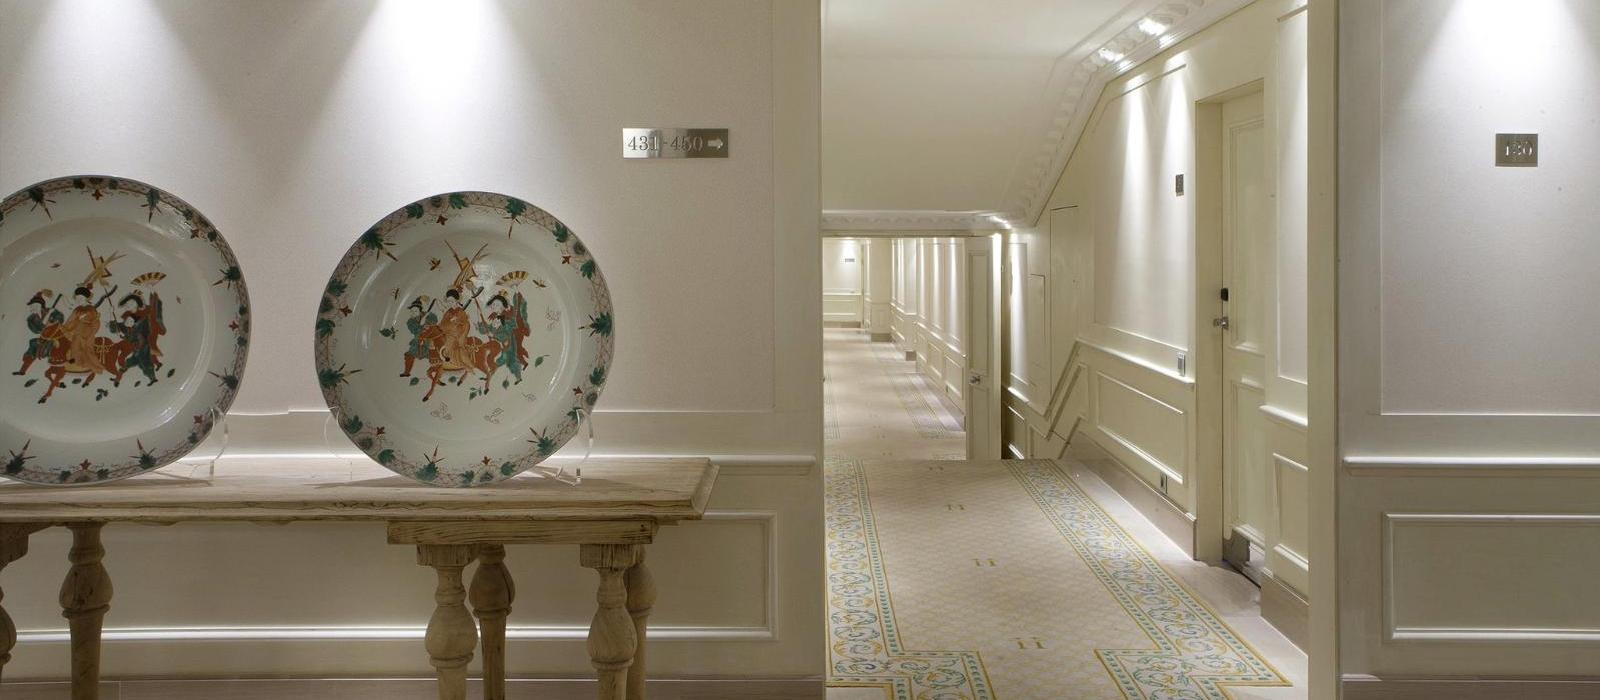 美琪大酒店(Majestic Hotel & Spa) 图片  www.lhw.cn